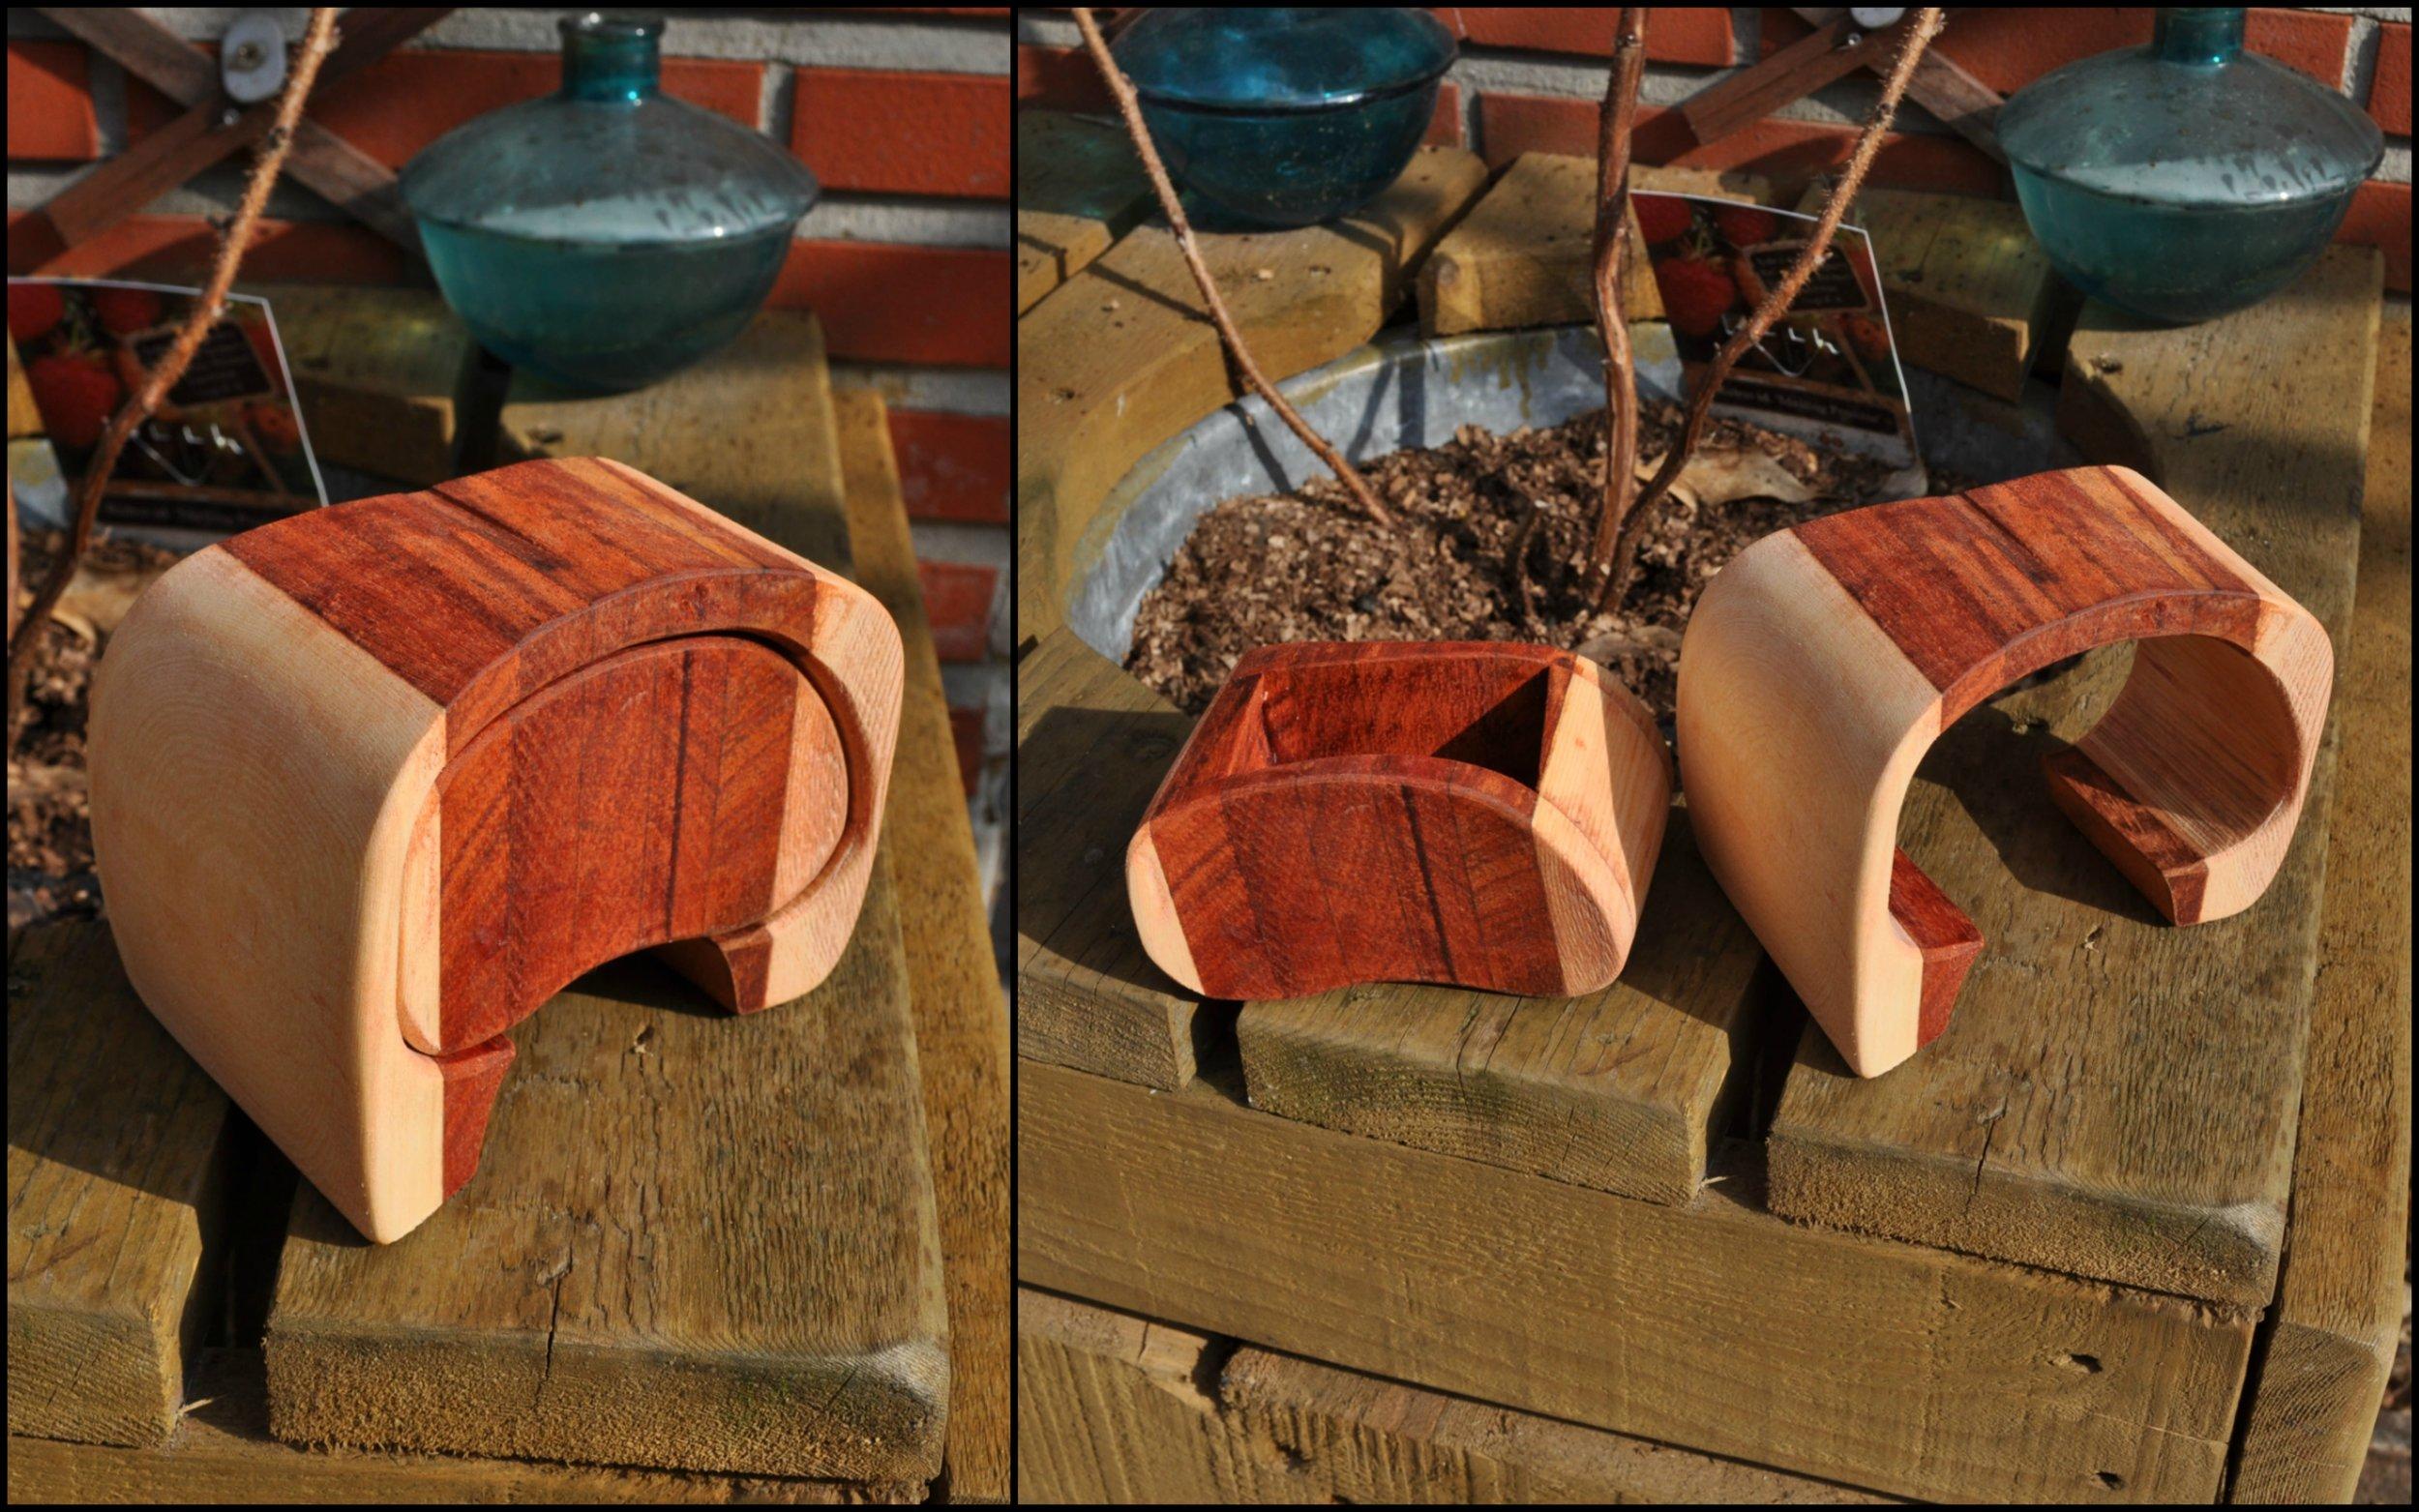 bandsaw box 4.jpg